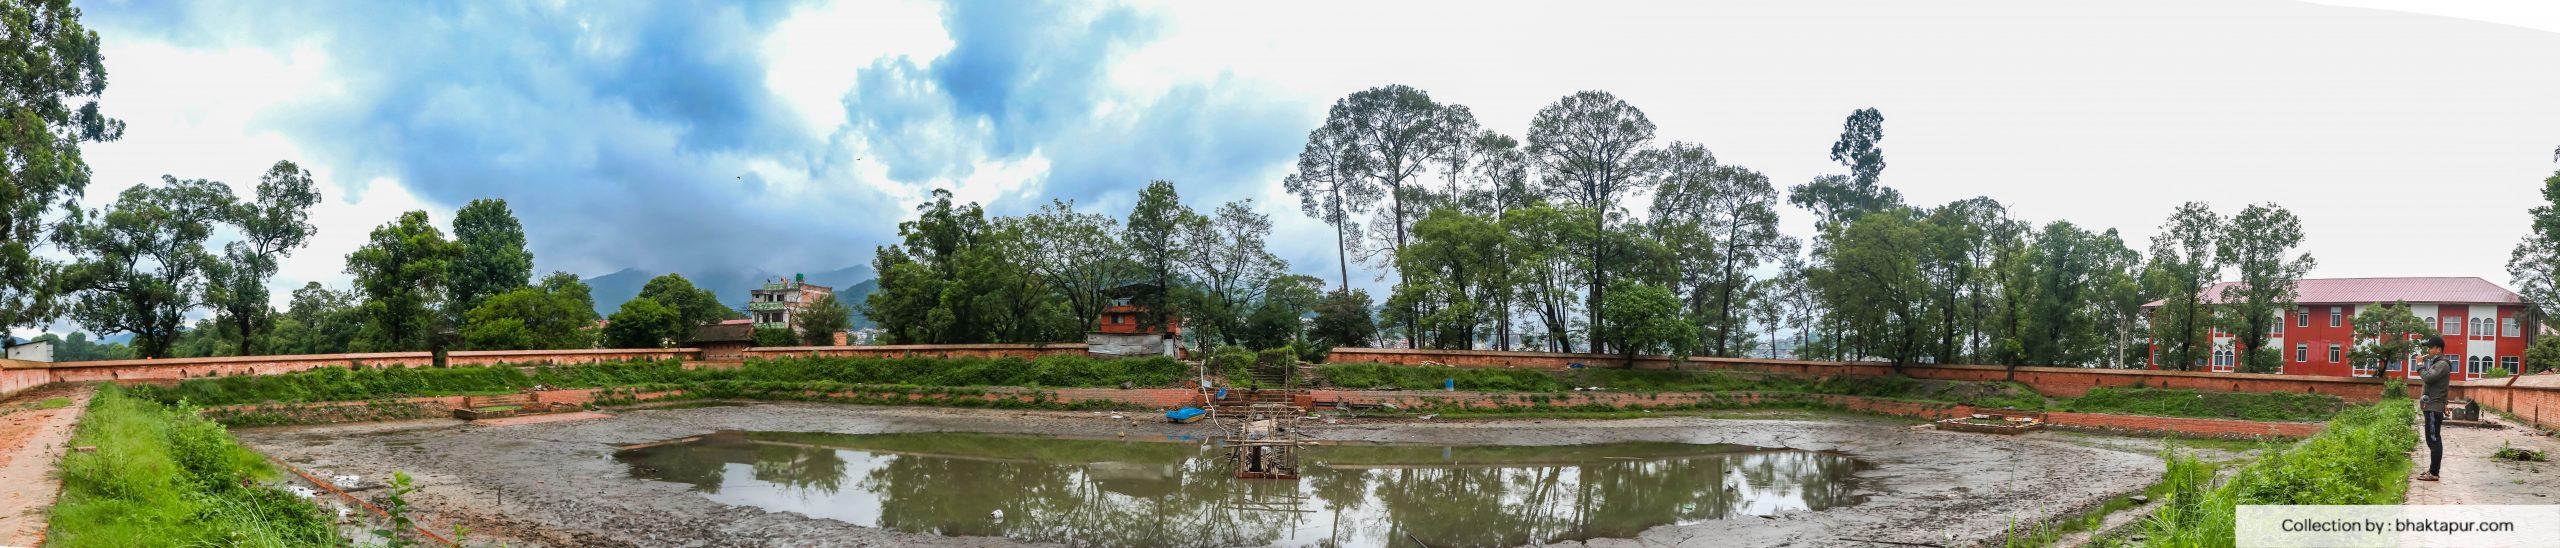 Ranipokhari of Bhaktapur image